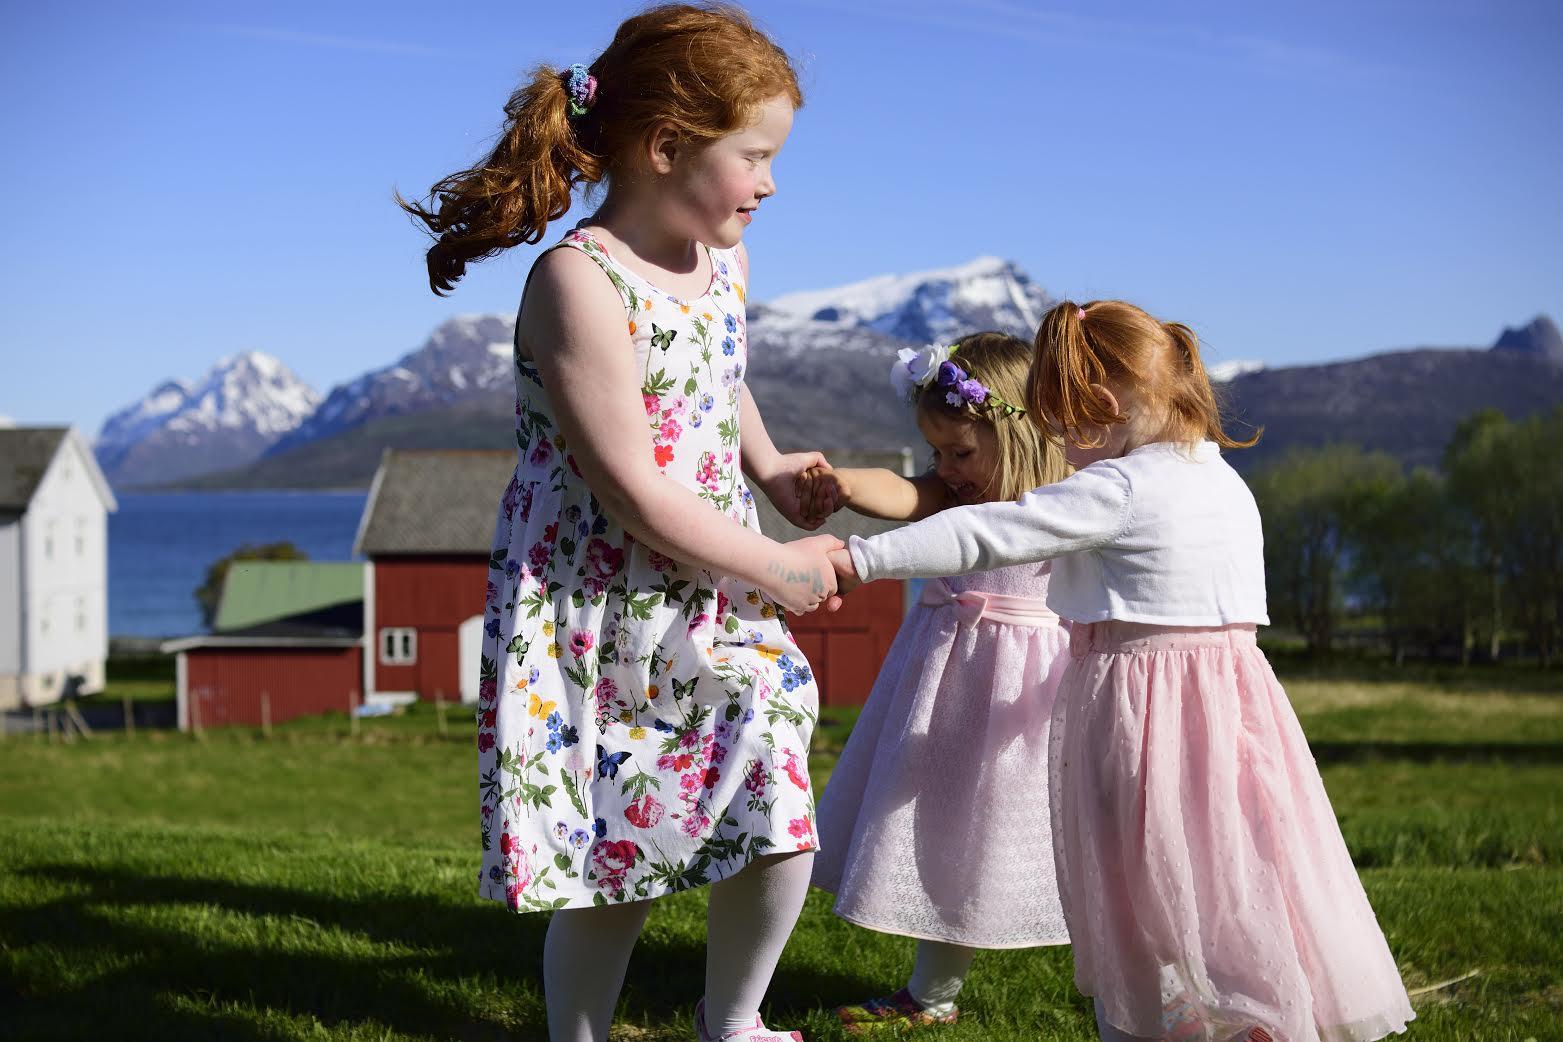 nordfolddagan barnelek